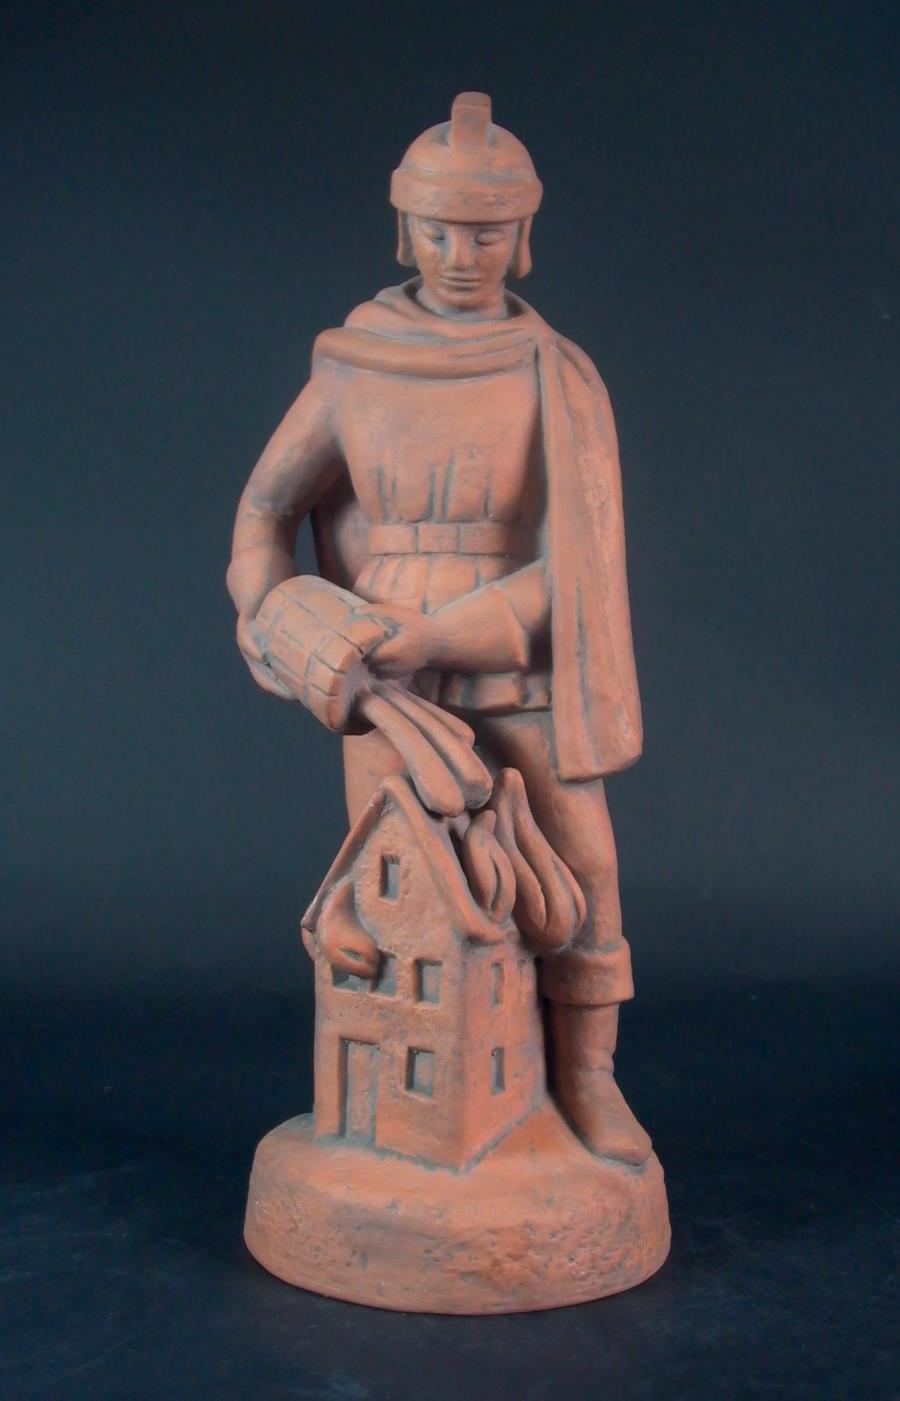 keramik figur heiliger florian karlsruher majolika bayerisch gmain. Black Bedroom Furniture Sets. Home Design Ideas